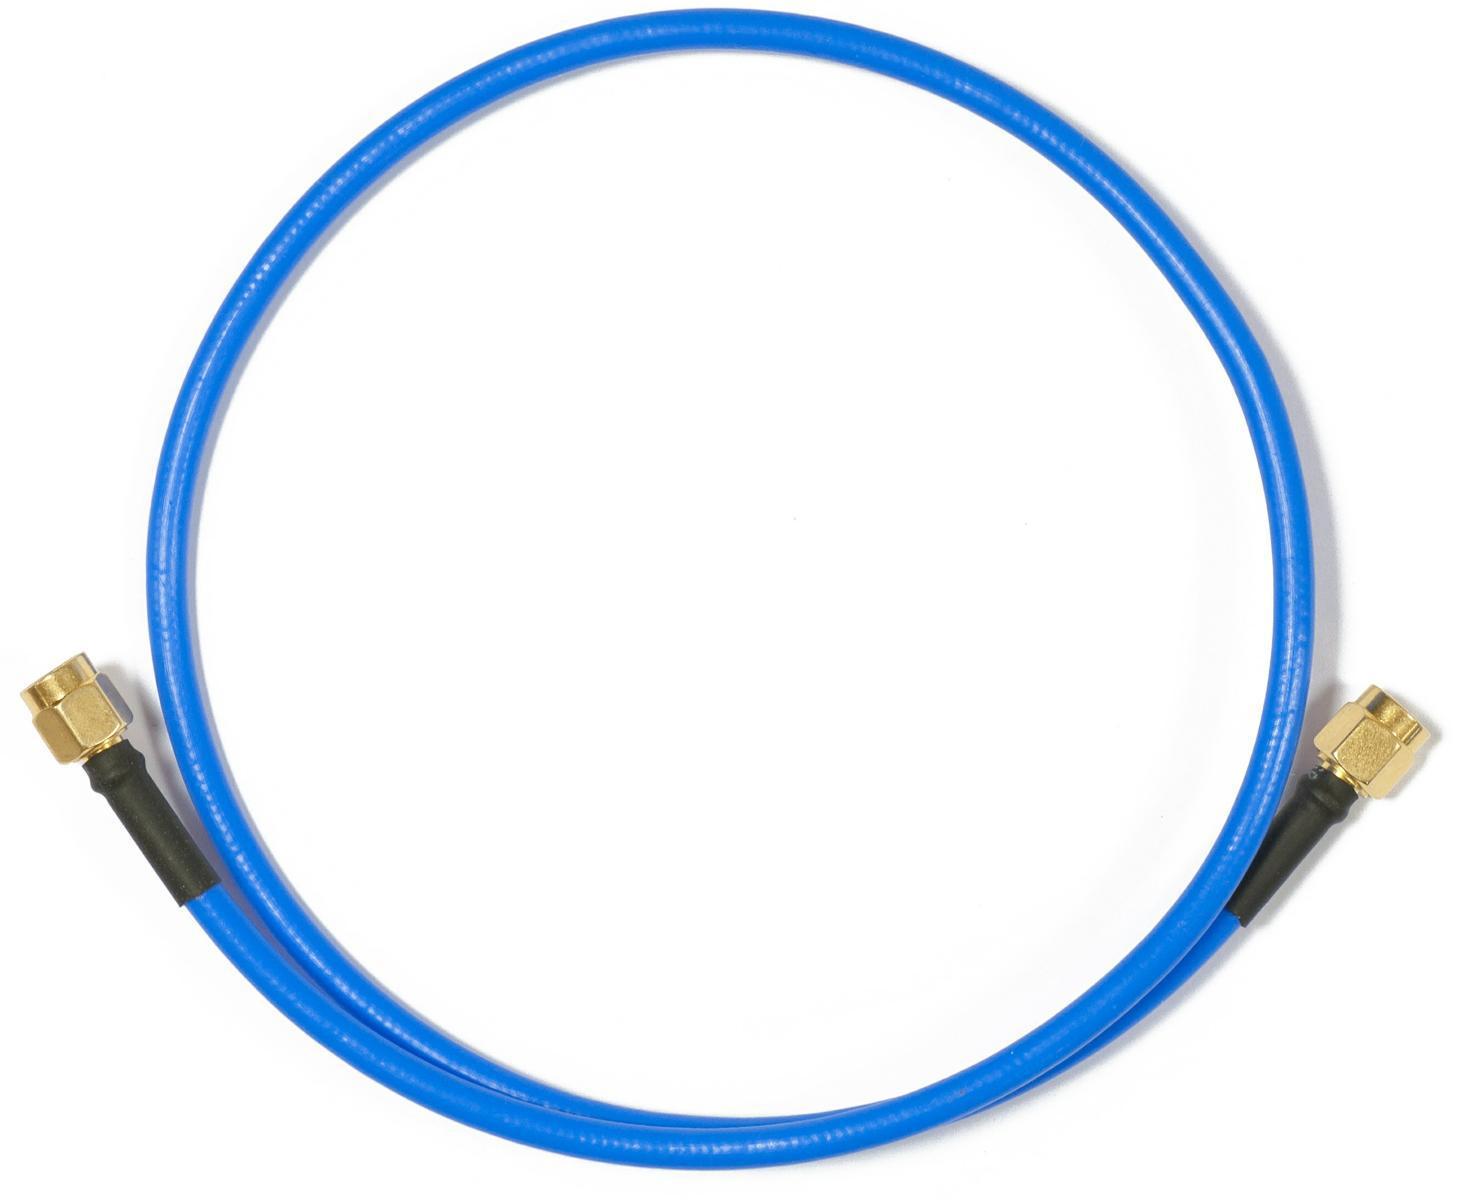 SICE Distributore Ufficiale  Accessories MikroTik Flex-guide (RPSMA to RPSMA cable 500mm) | AC/RPSMA